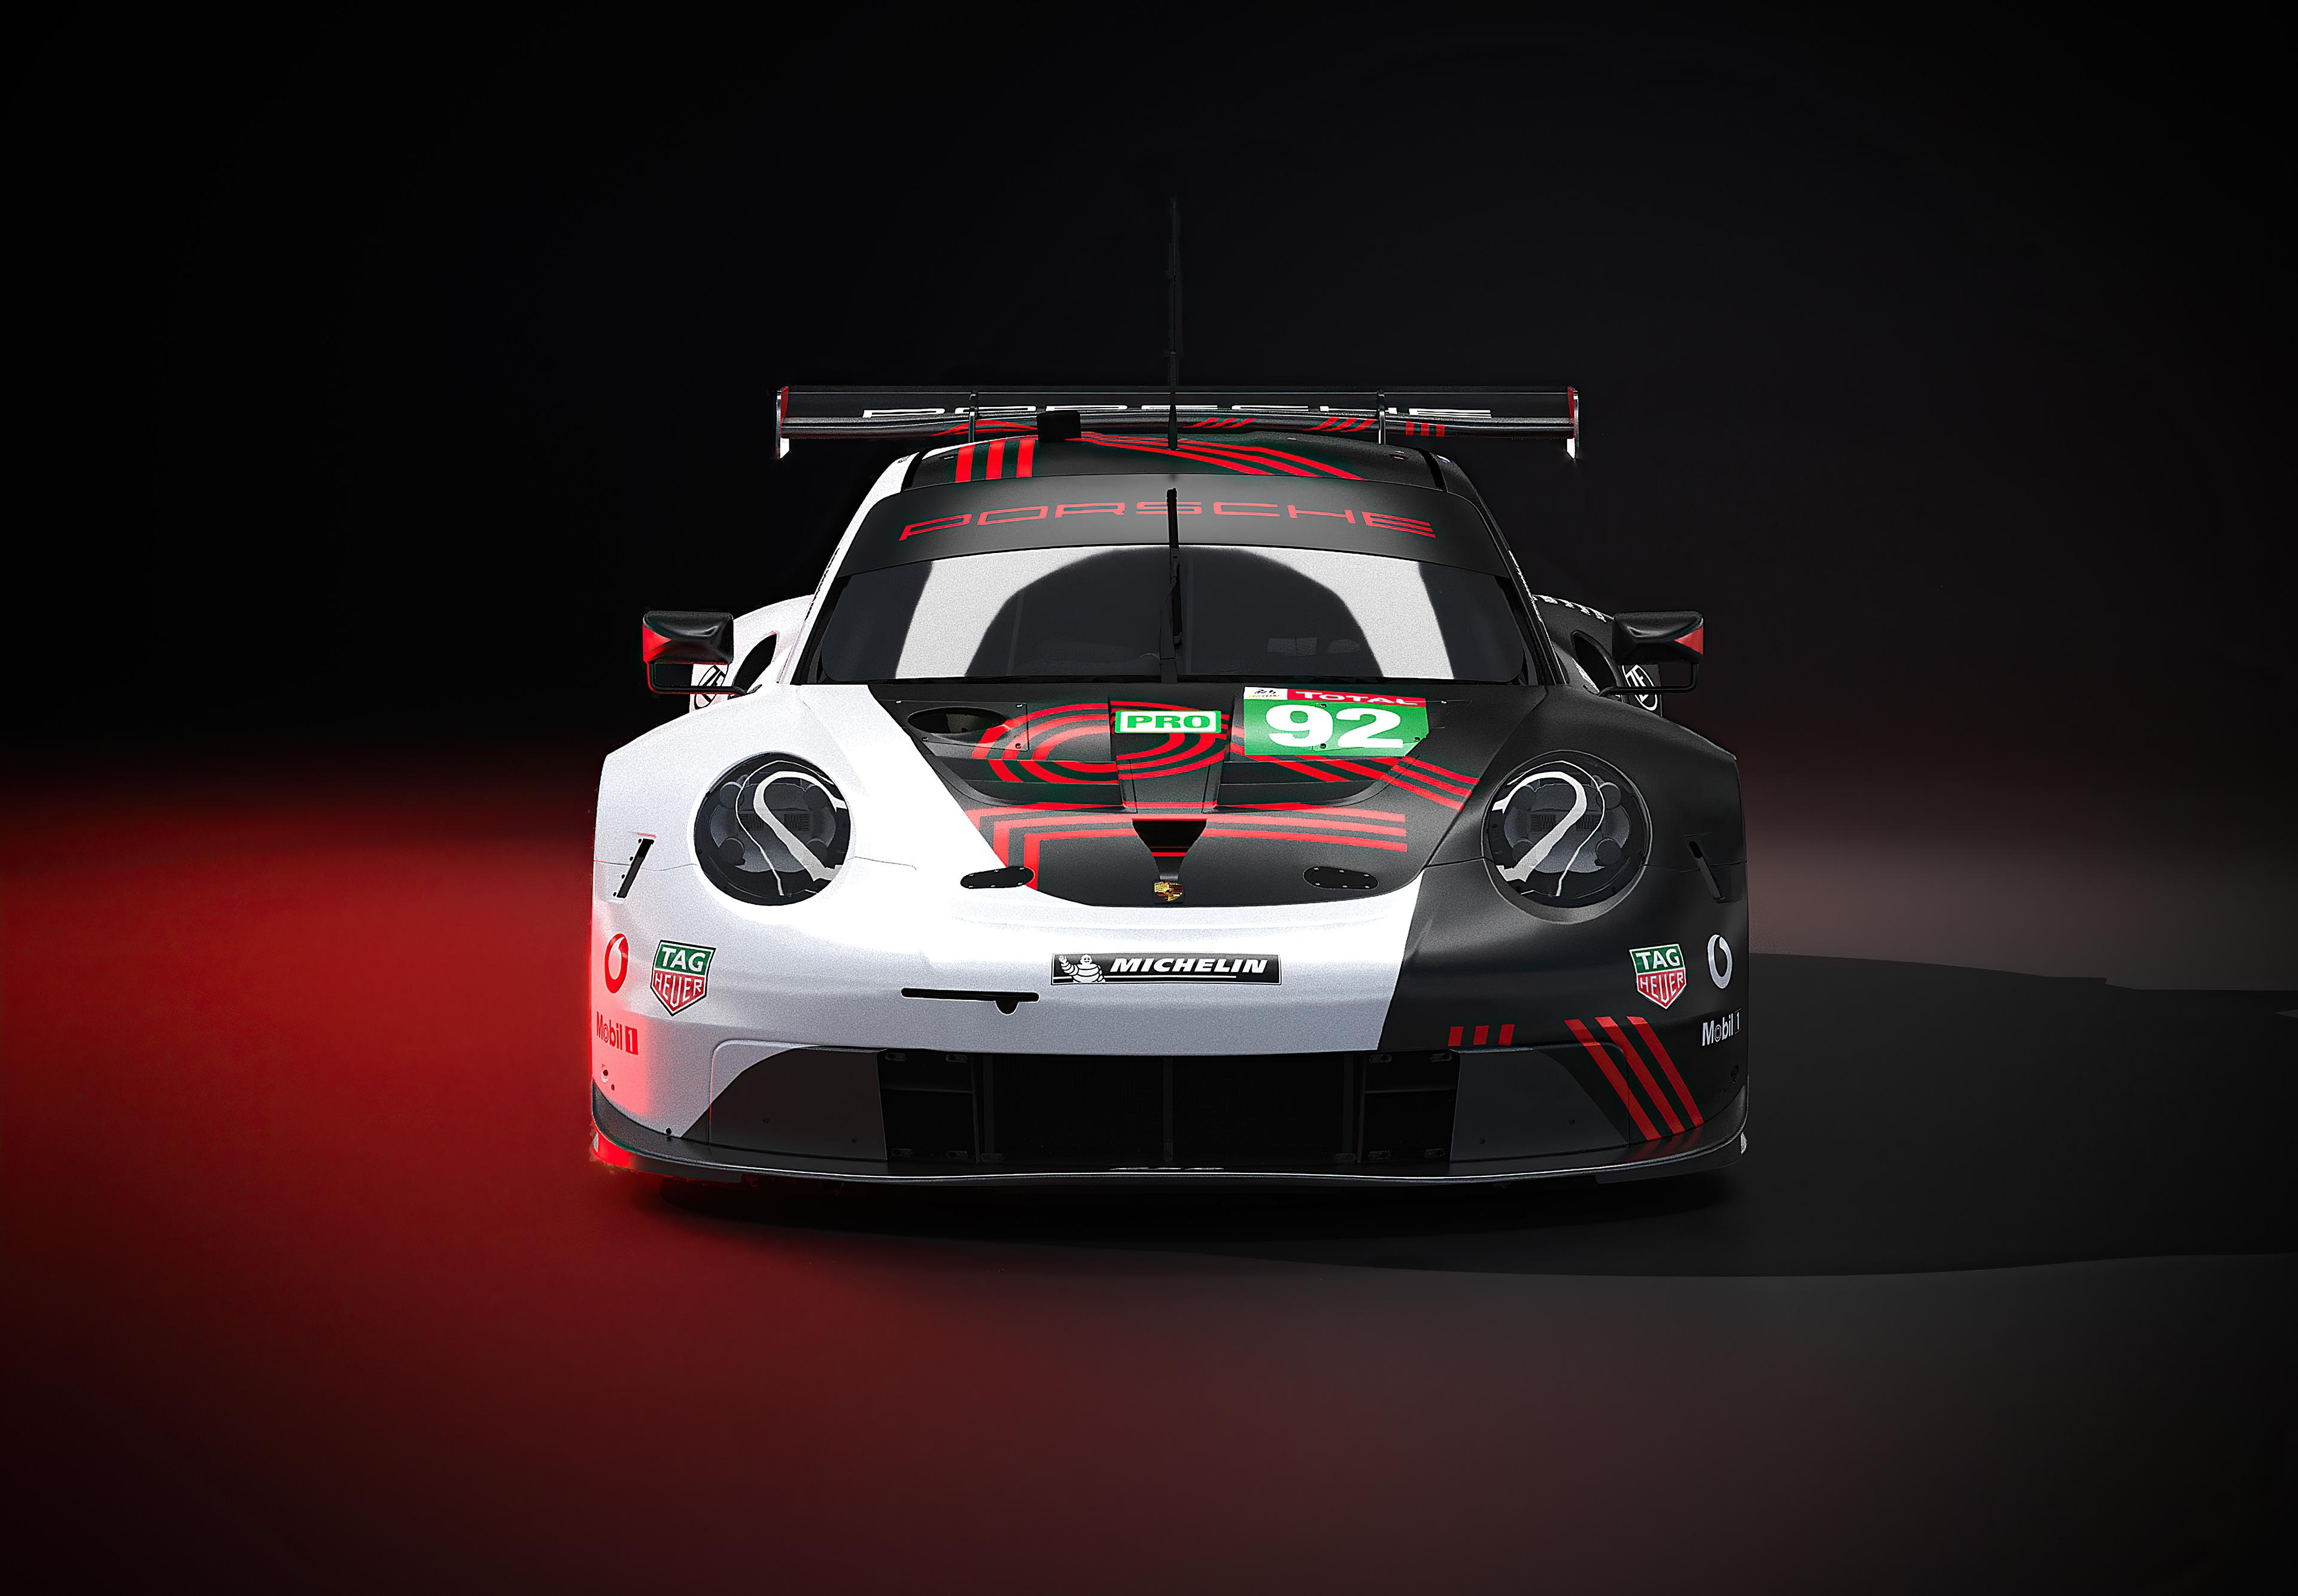 le mans porsche gte 4k 1618920700 - Le Mans Porsche Gte 4k - Le Mans Porsche Gte 4k wallpapers